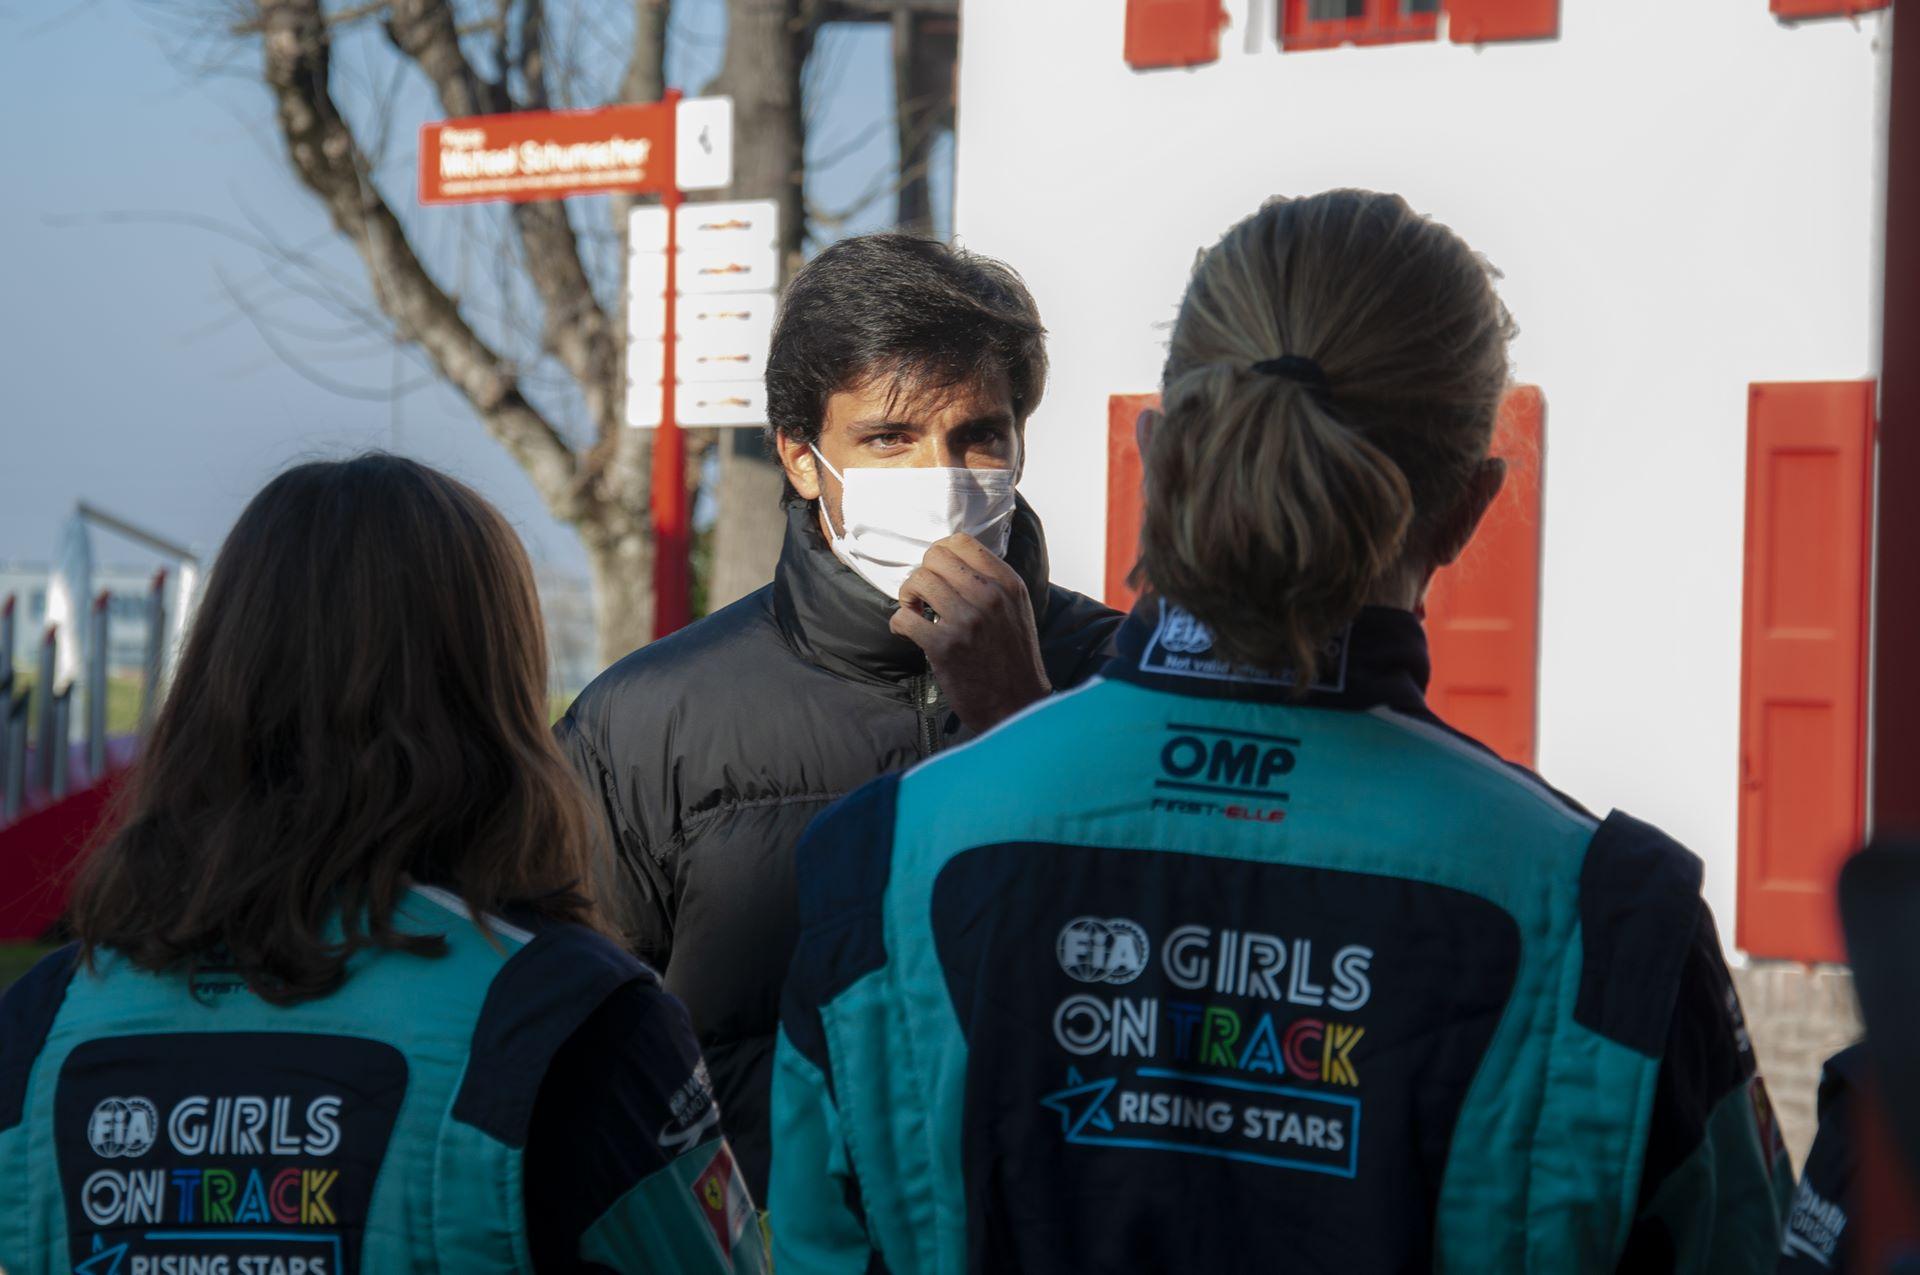 FDA CAMP GIRLS ON TRACK - FIORANO 14-15/01/2021